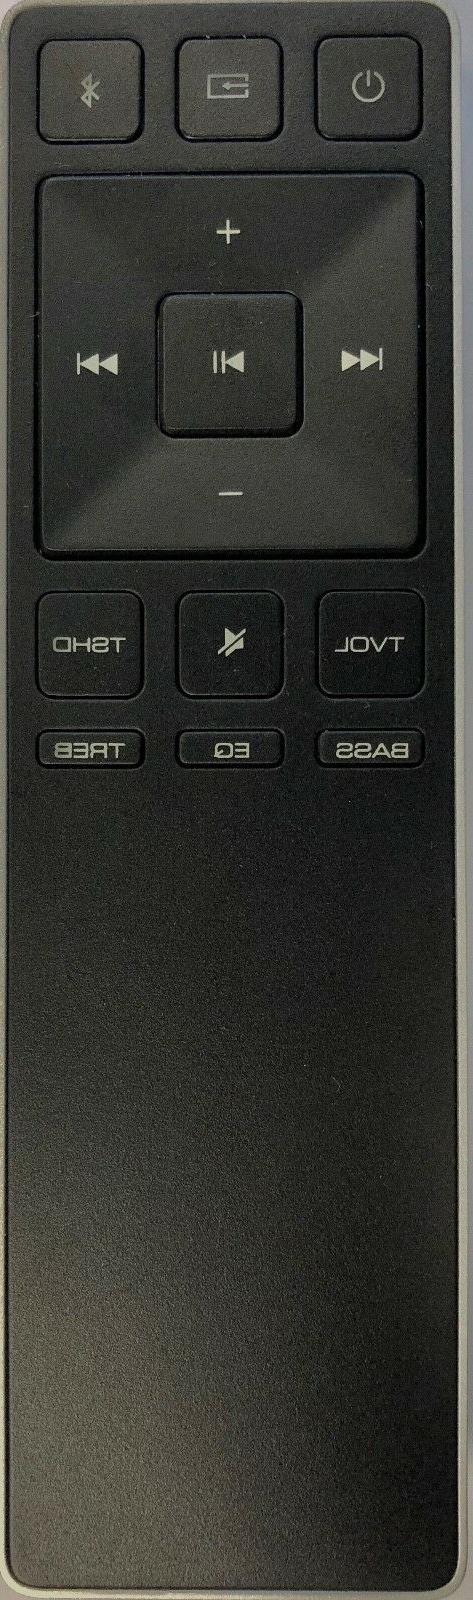 genuine new xrs320n e3 sound bar remote